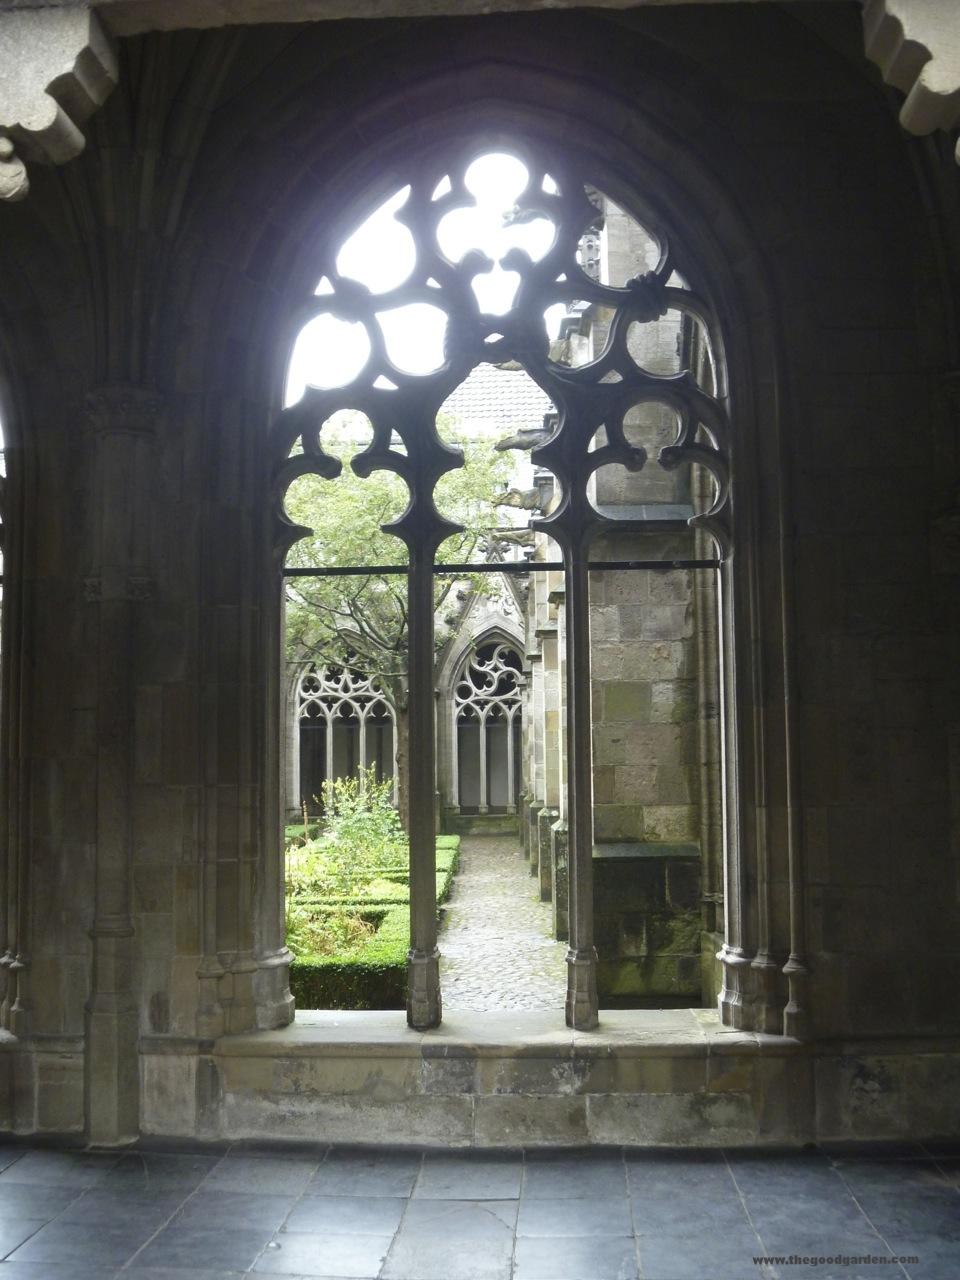 thegoodgarden|utrecht|cloistergarden|30034.jpg